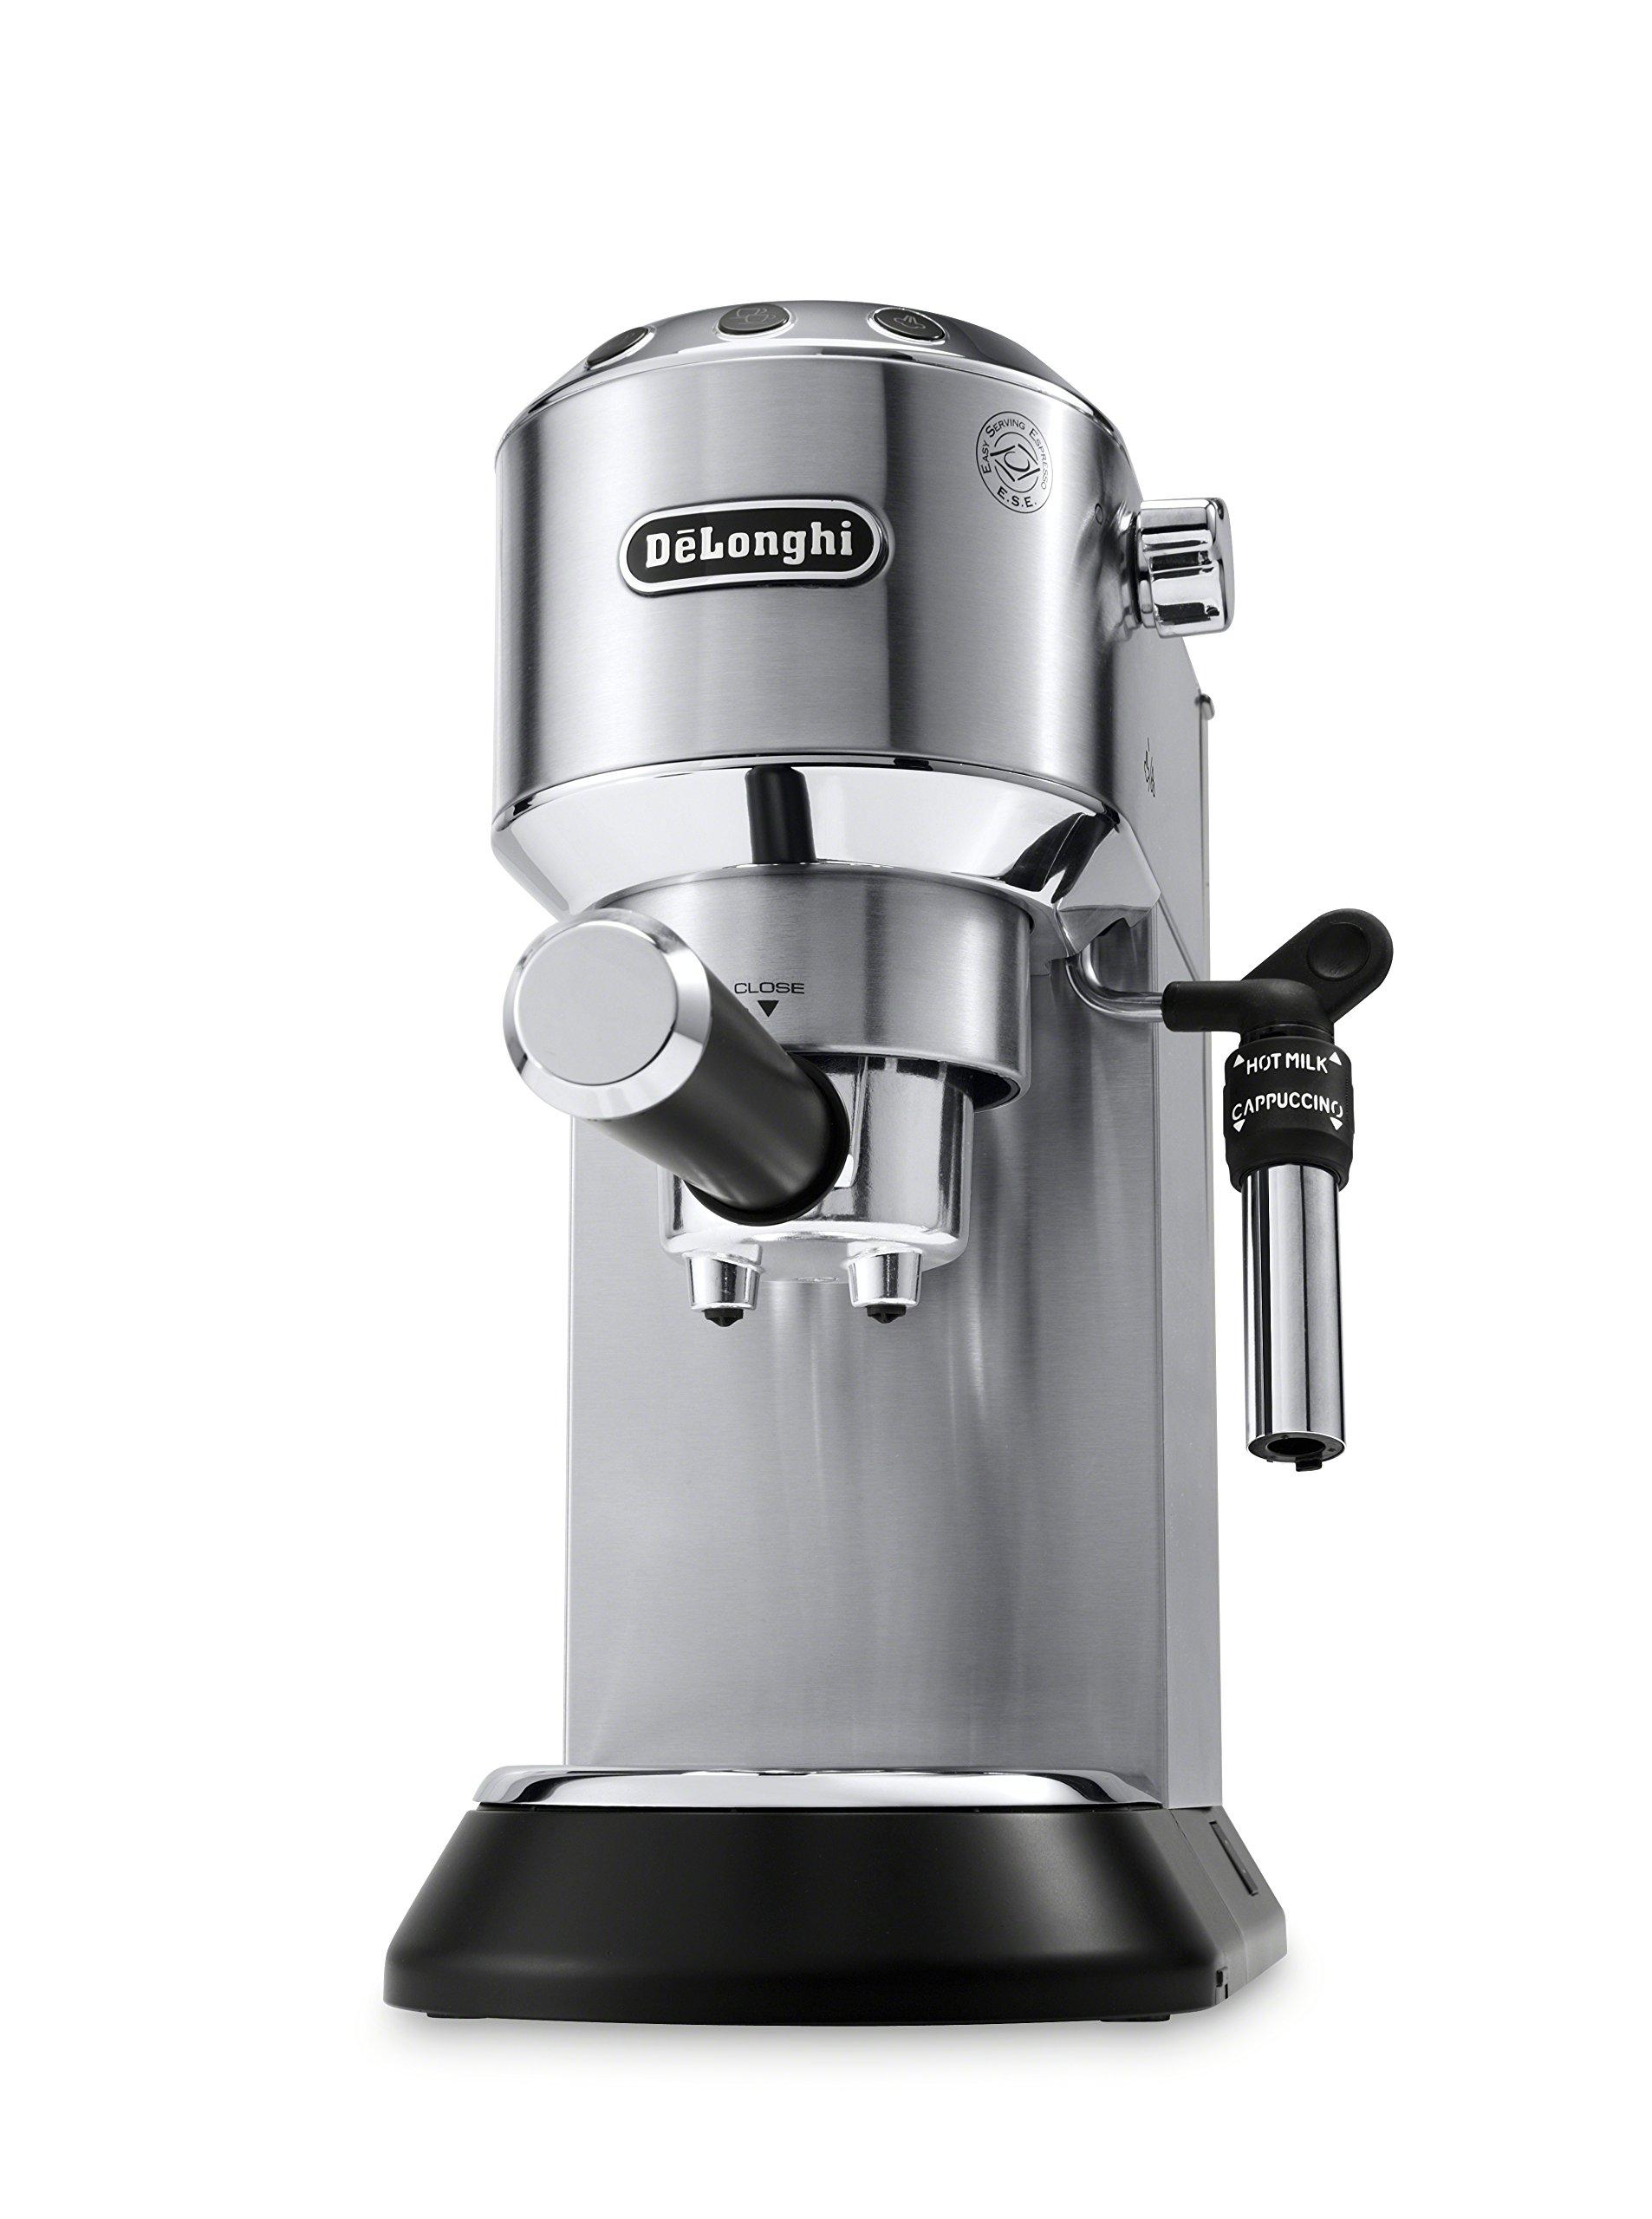 DeLonghi America, Inc EC685M Dedica Deluxe espresso, Silver by DeLonghi America, Inc (Image #2)